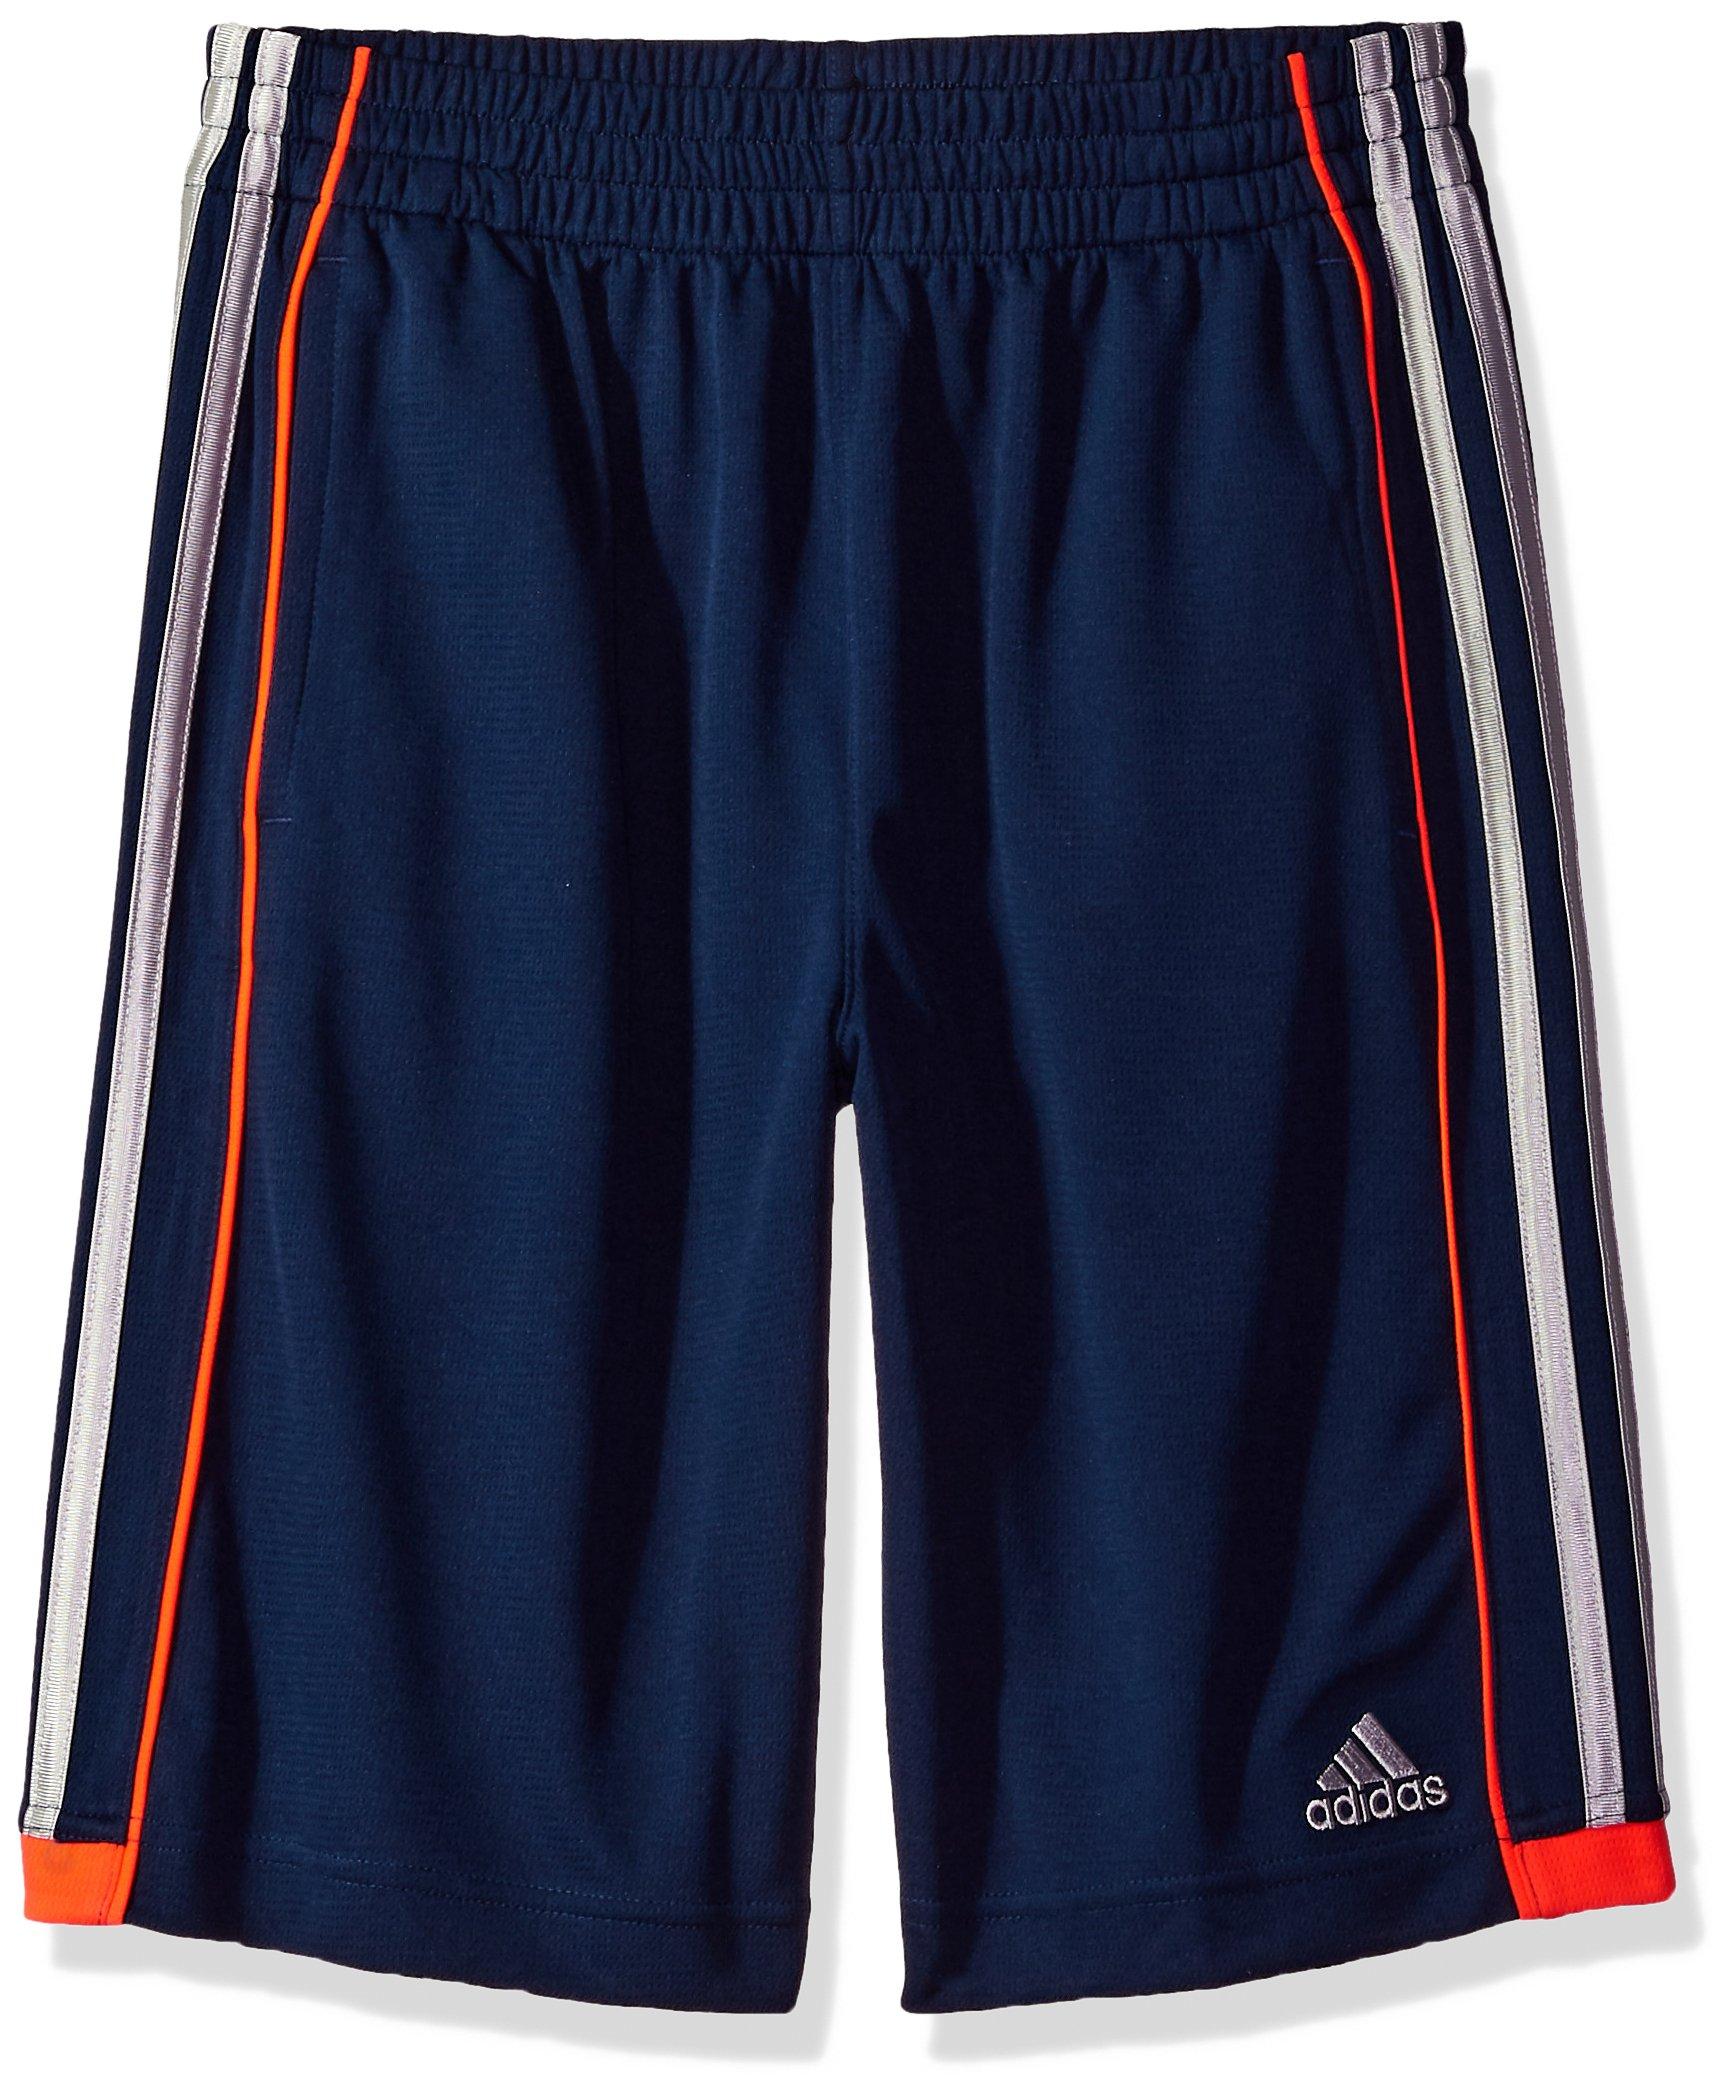 adidas Boys' Big Athletic Short, Navy/Orange M (10/12)